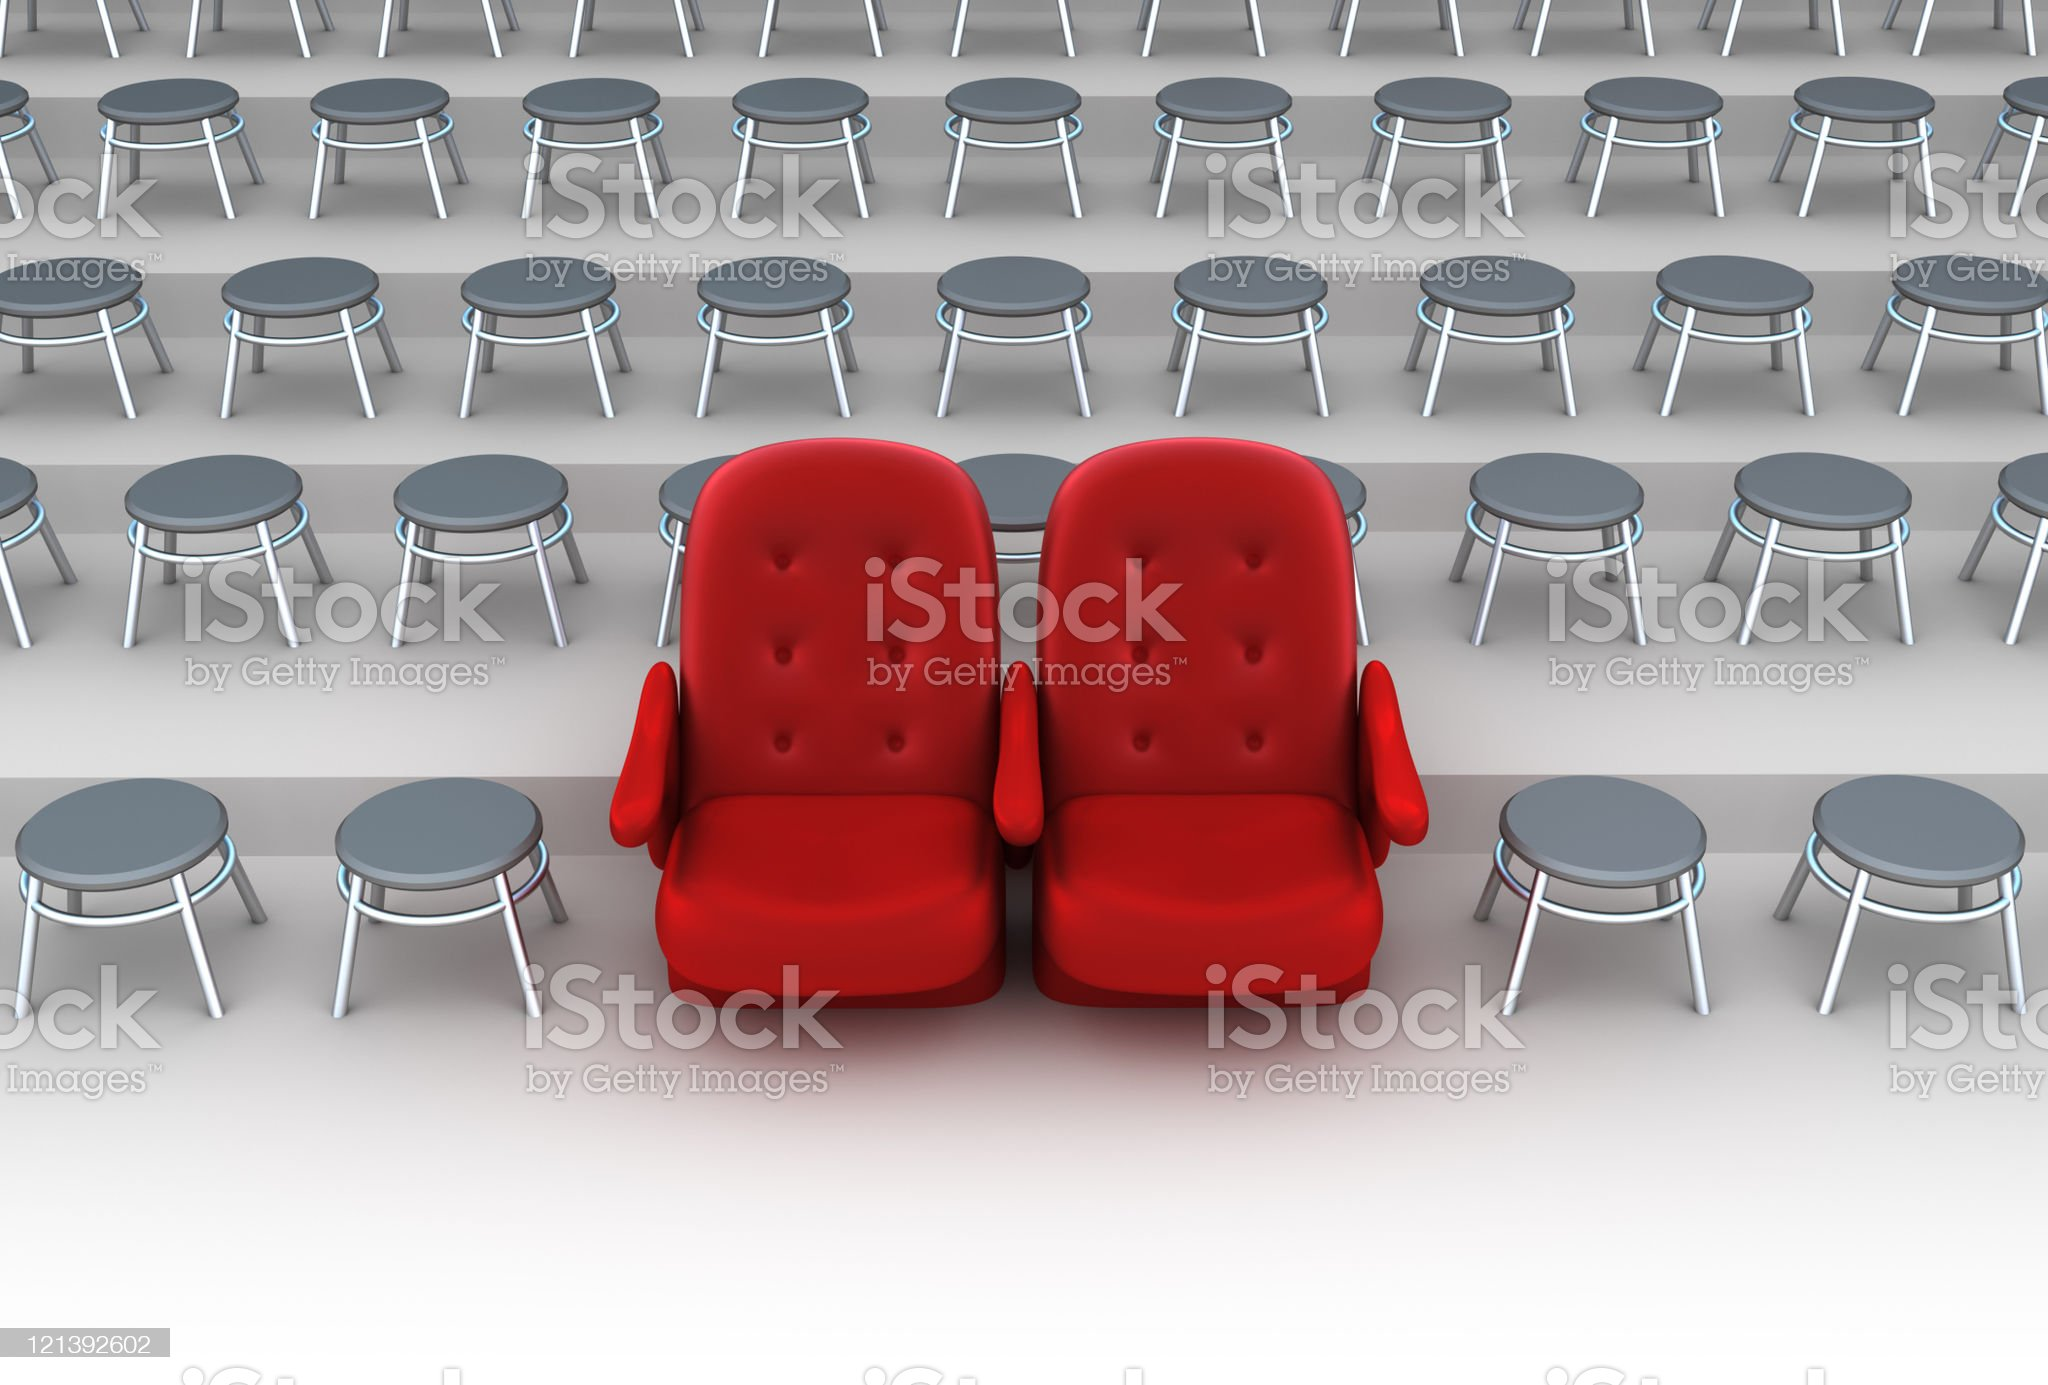 Vip seats concept royalty-free stock photo